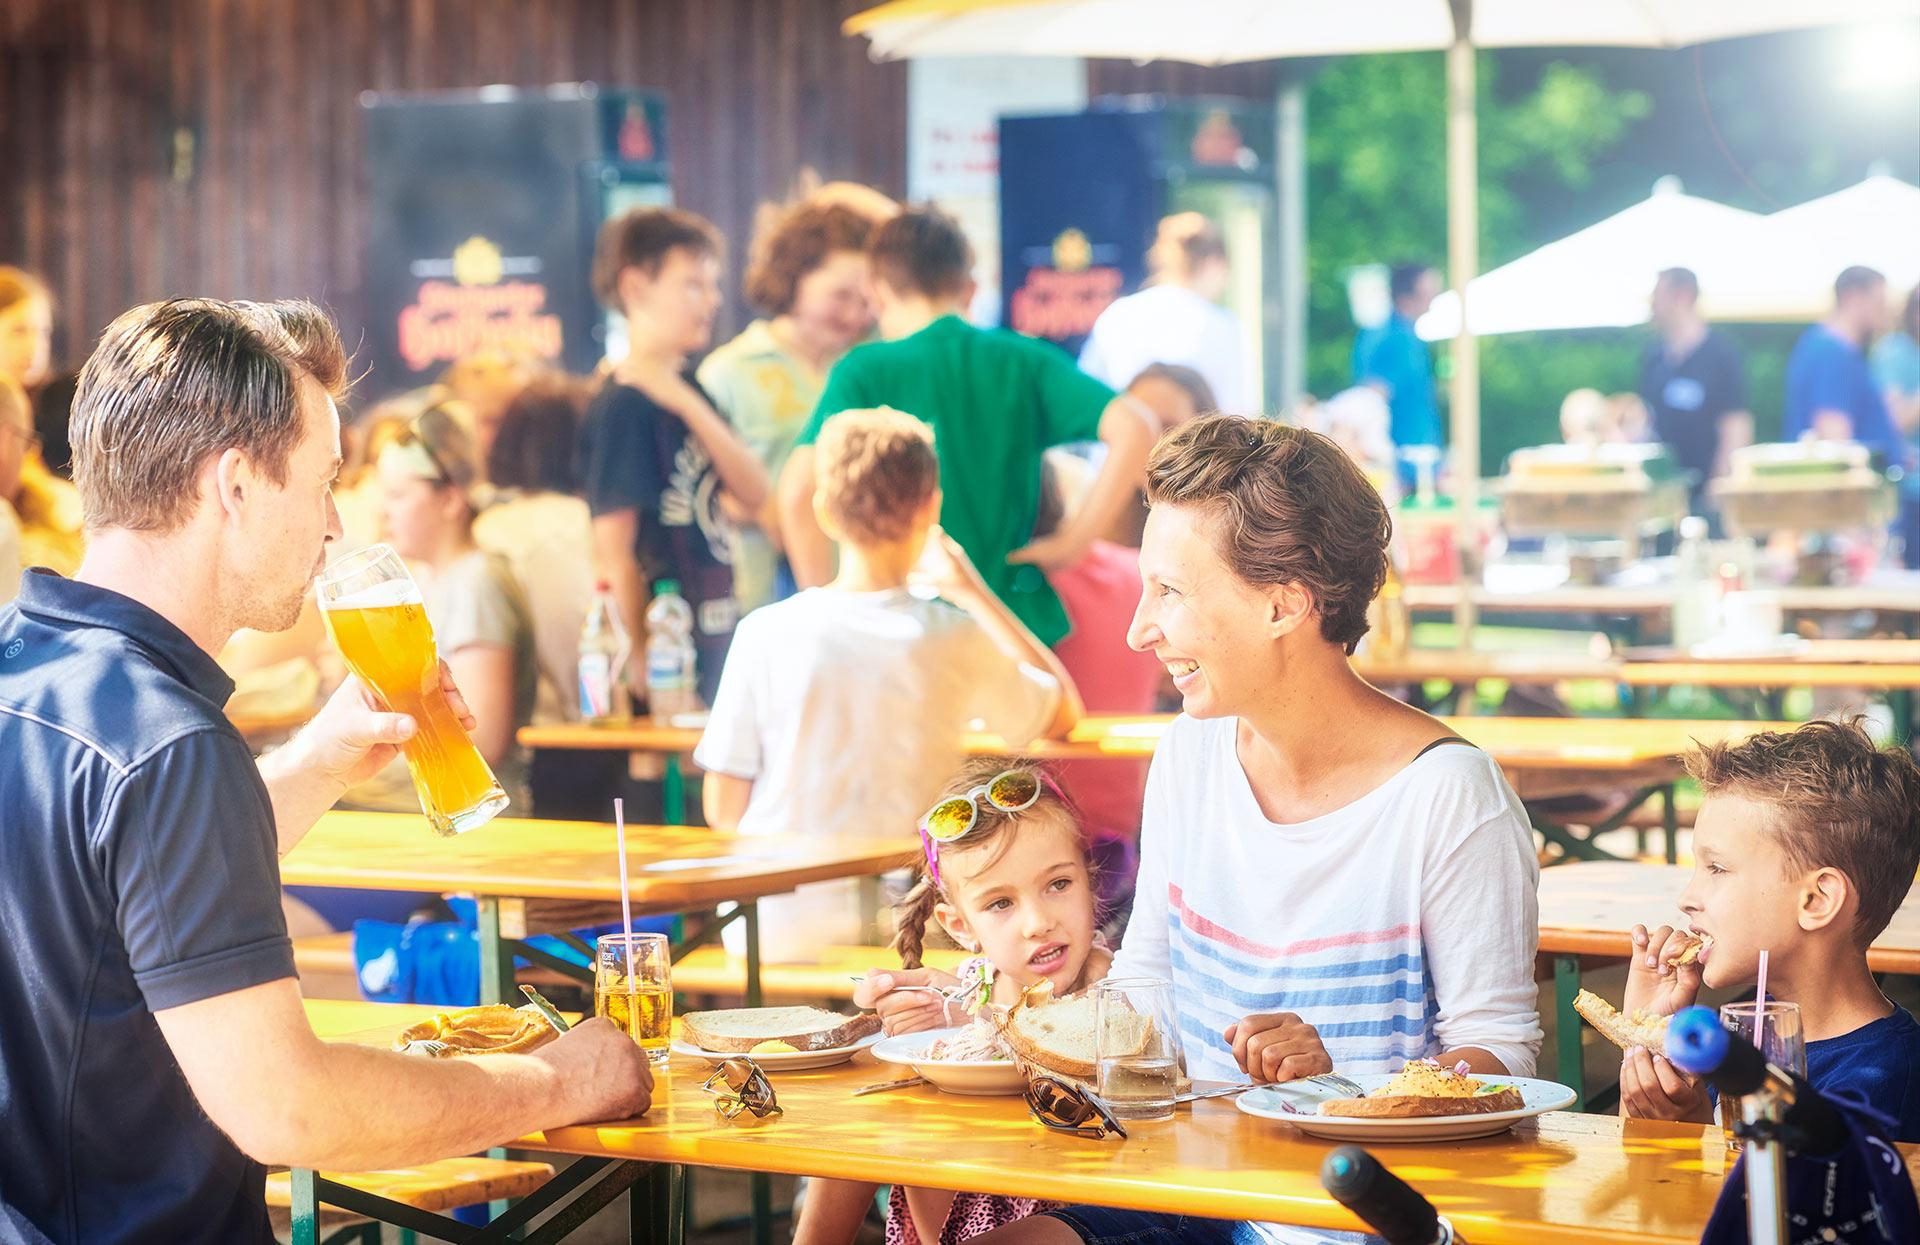 stuttgart-biergarten-geburtstagsfeier